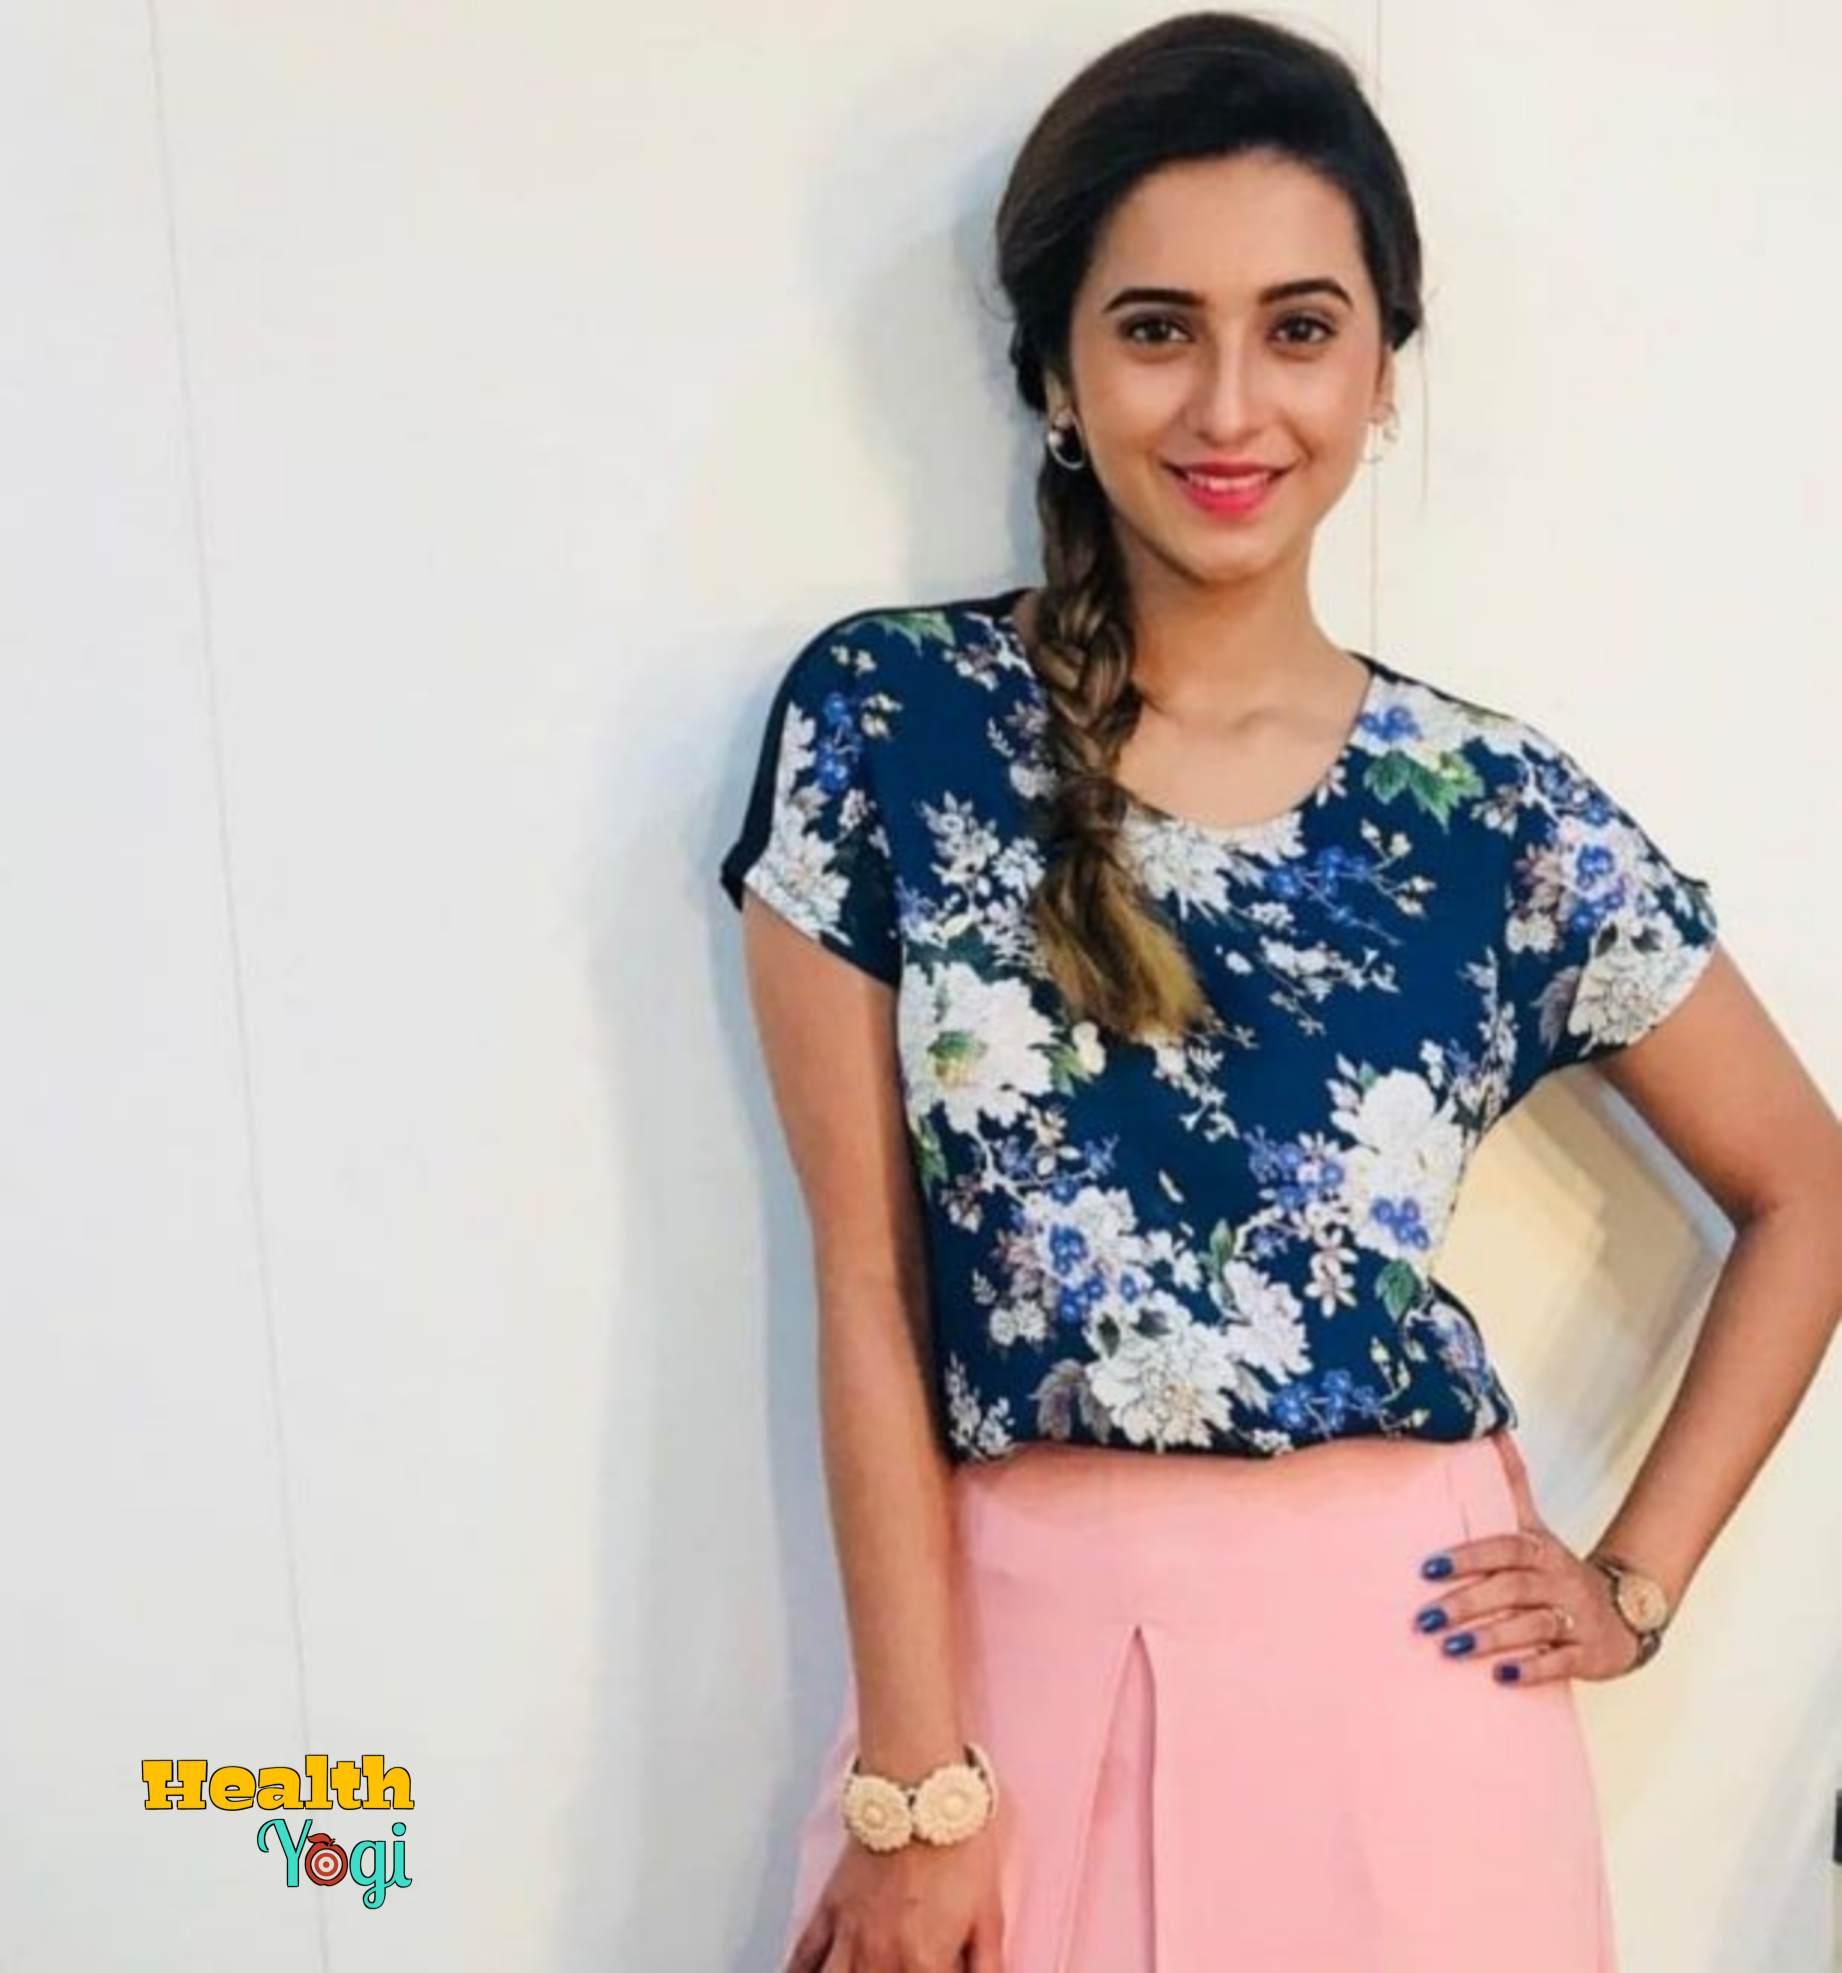 Shivani Surve Diet Plan and Workout Routine